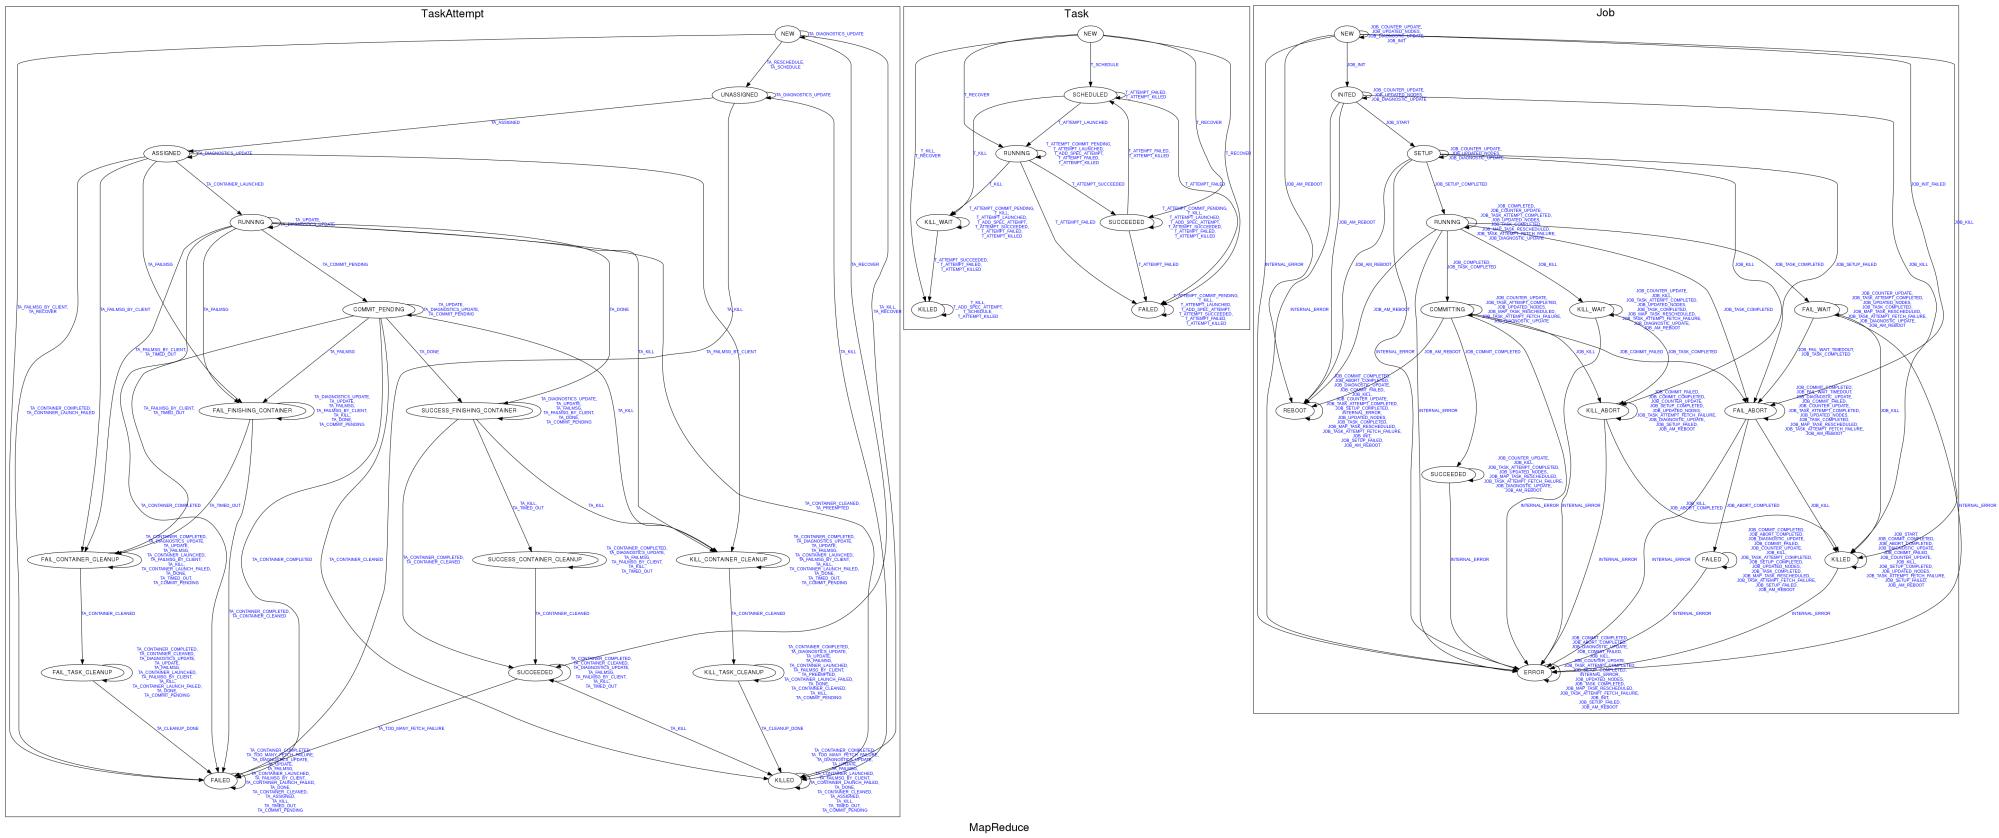 hight resolution of mapreduce state diagram